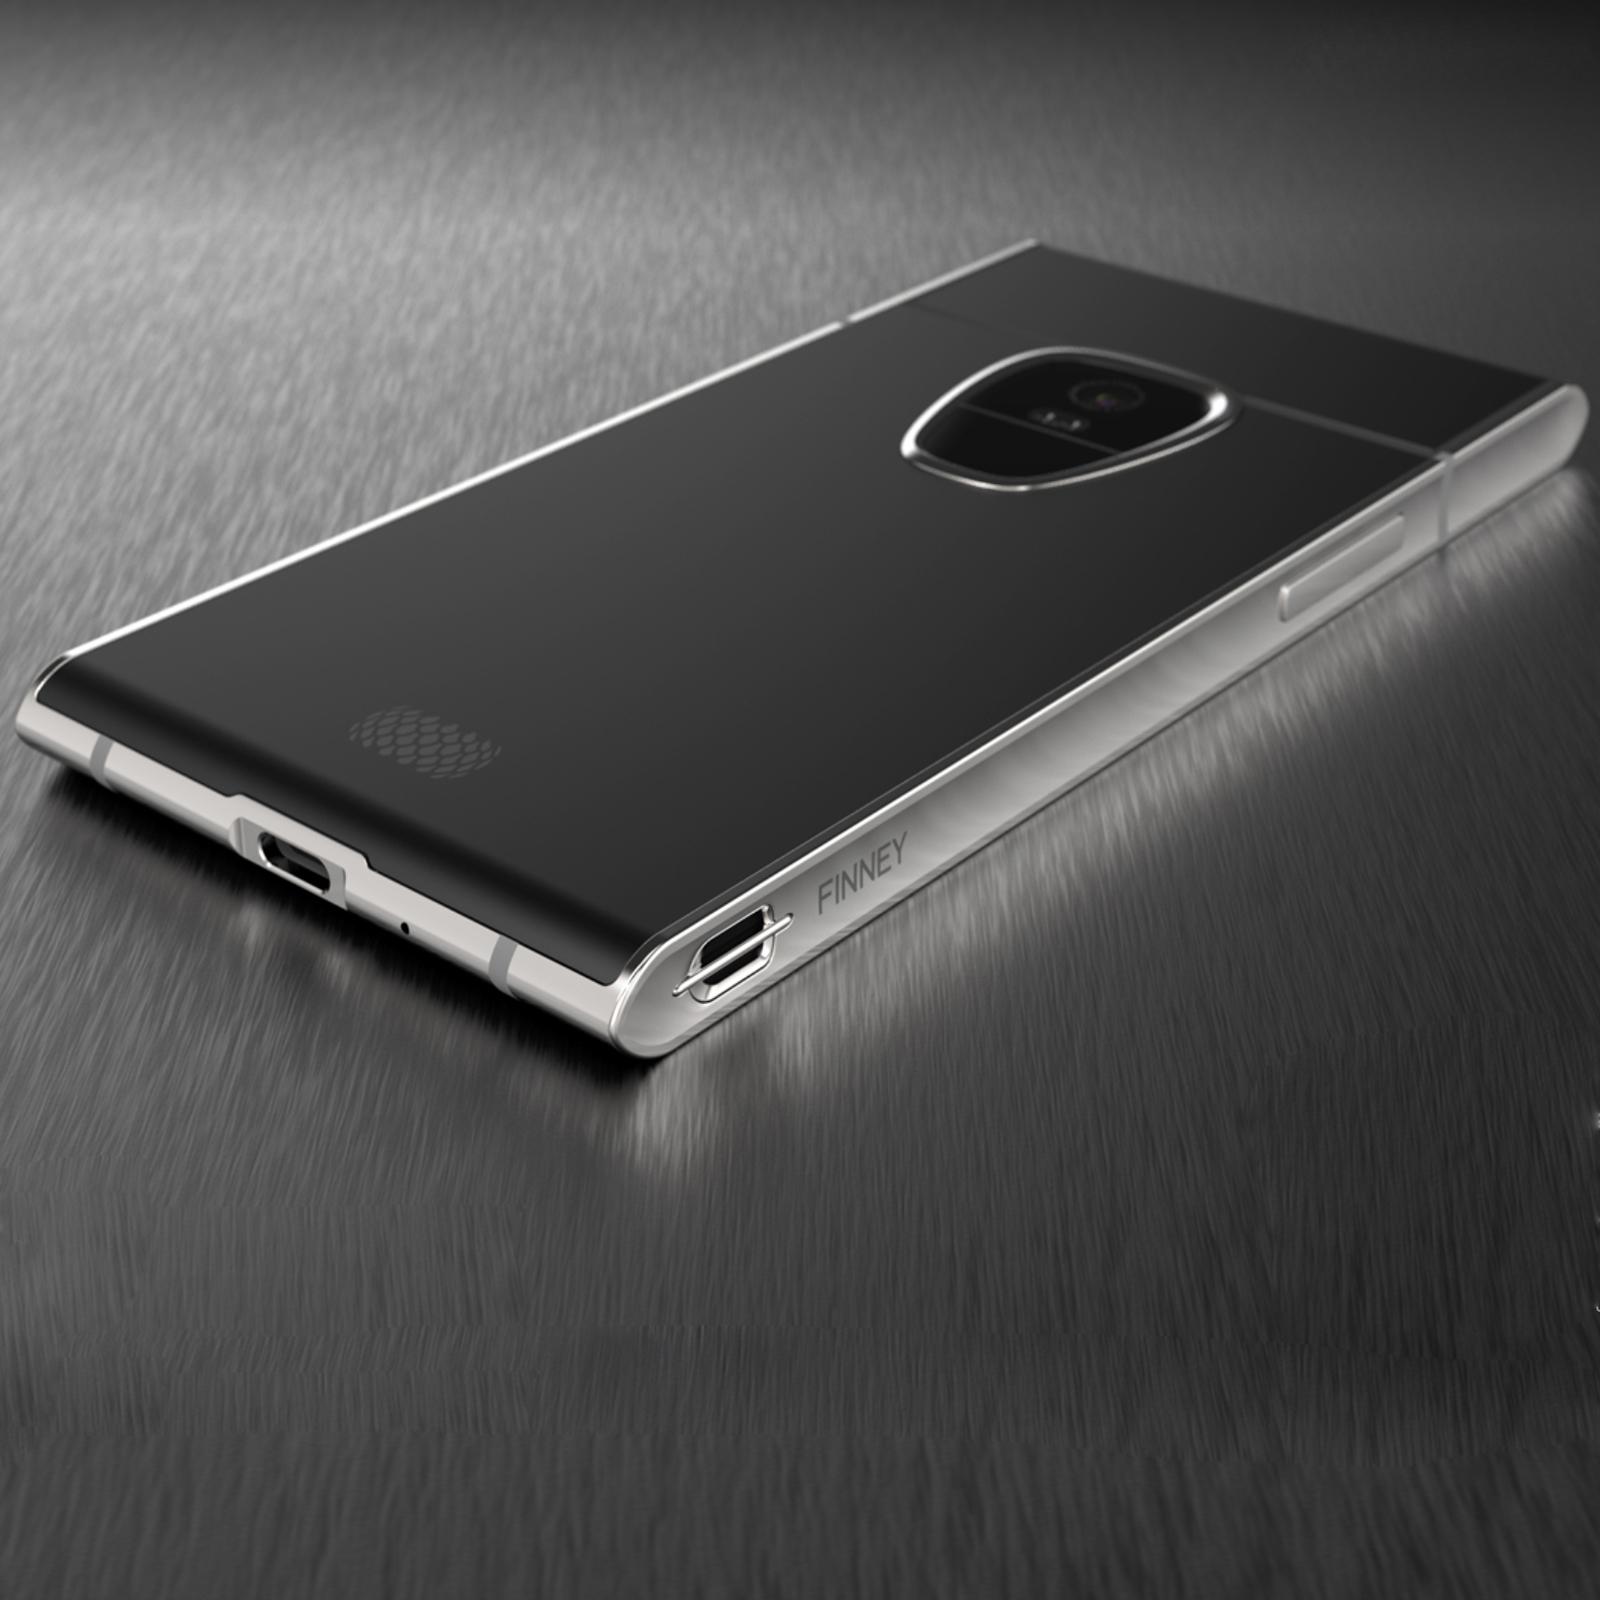 Siren Labs Launches 'Finney' the Blockchain-Centric Smartphone